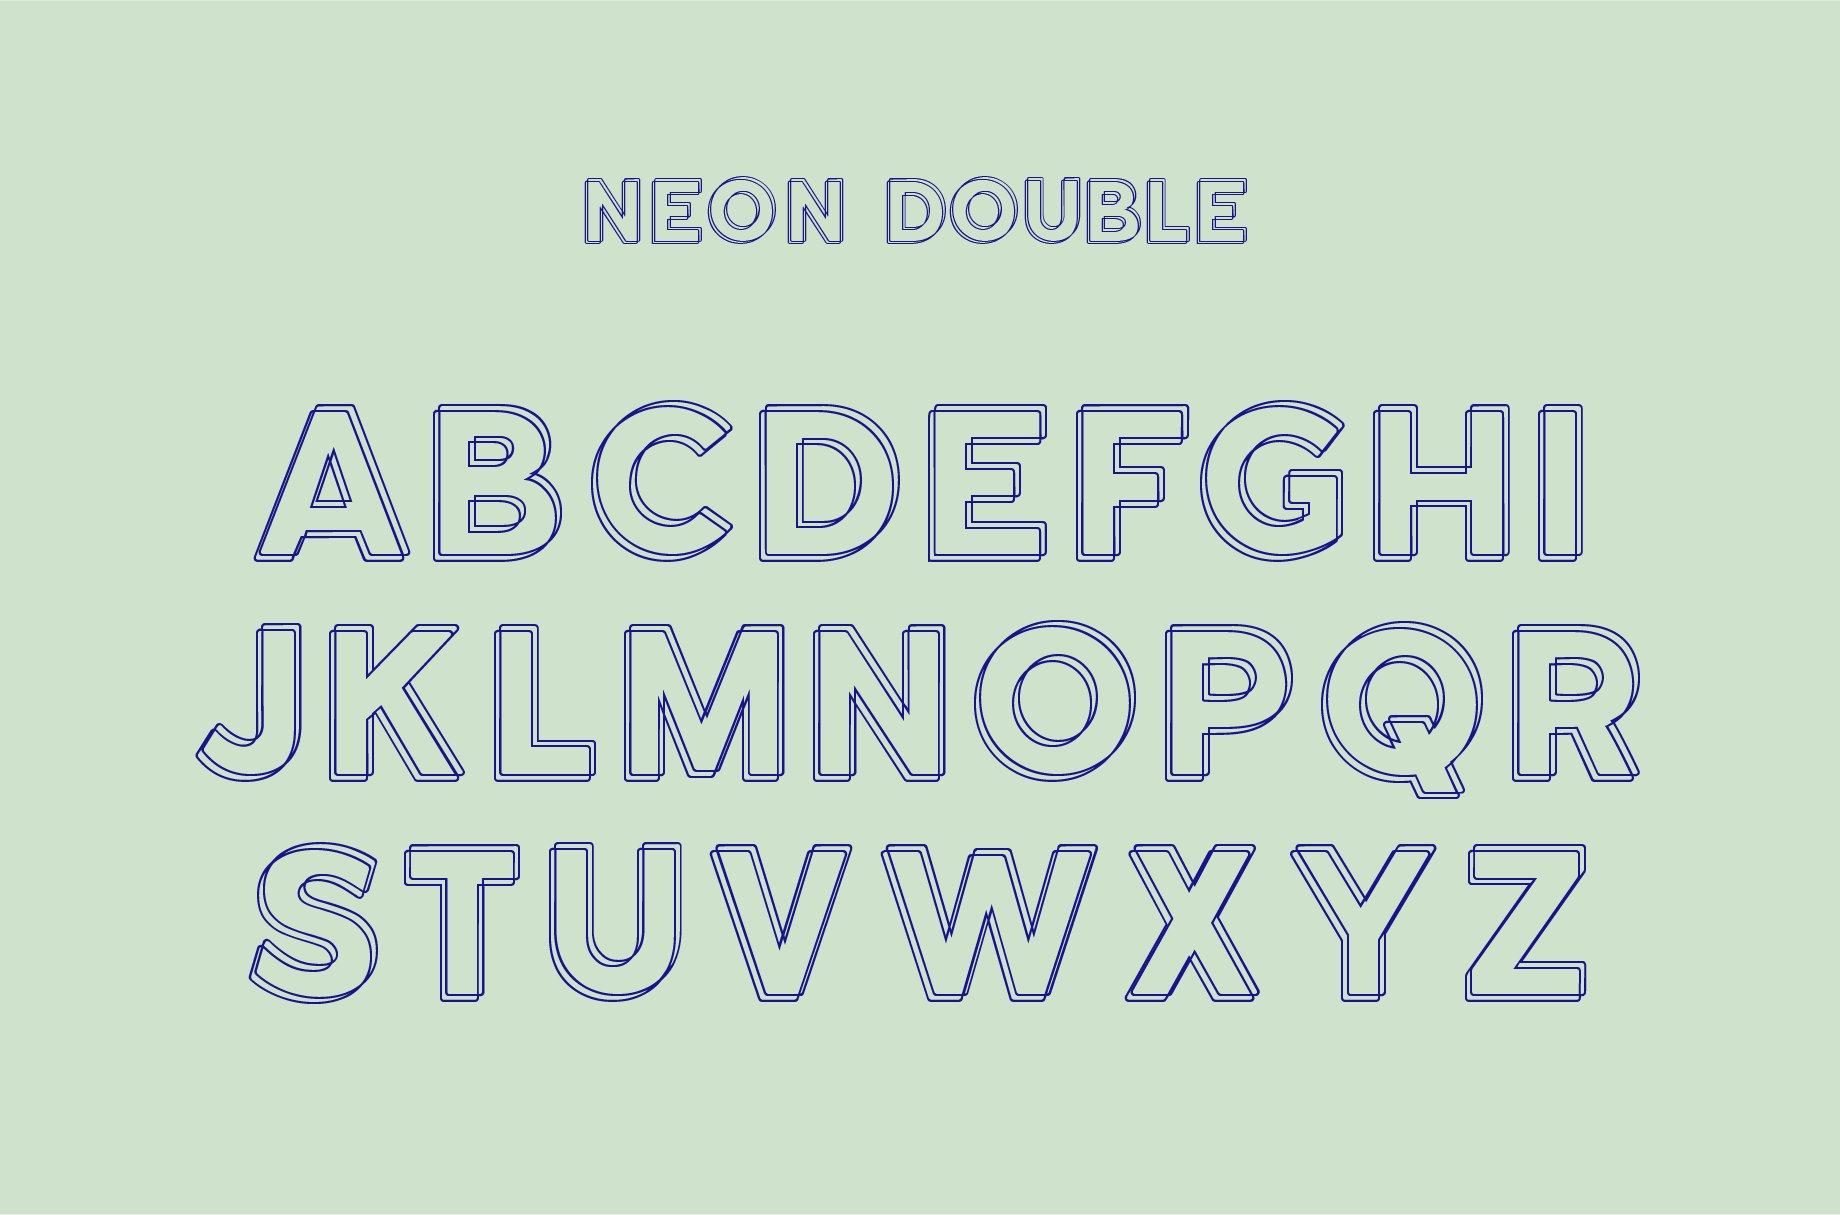 neon-font-by-big-cat-creative-08-.jpg